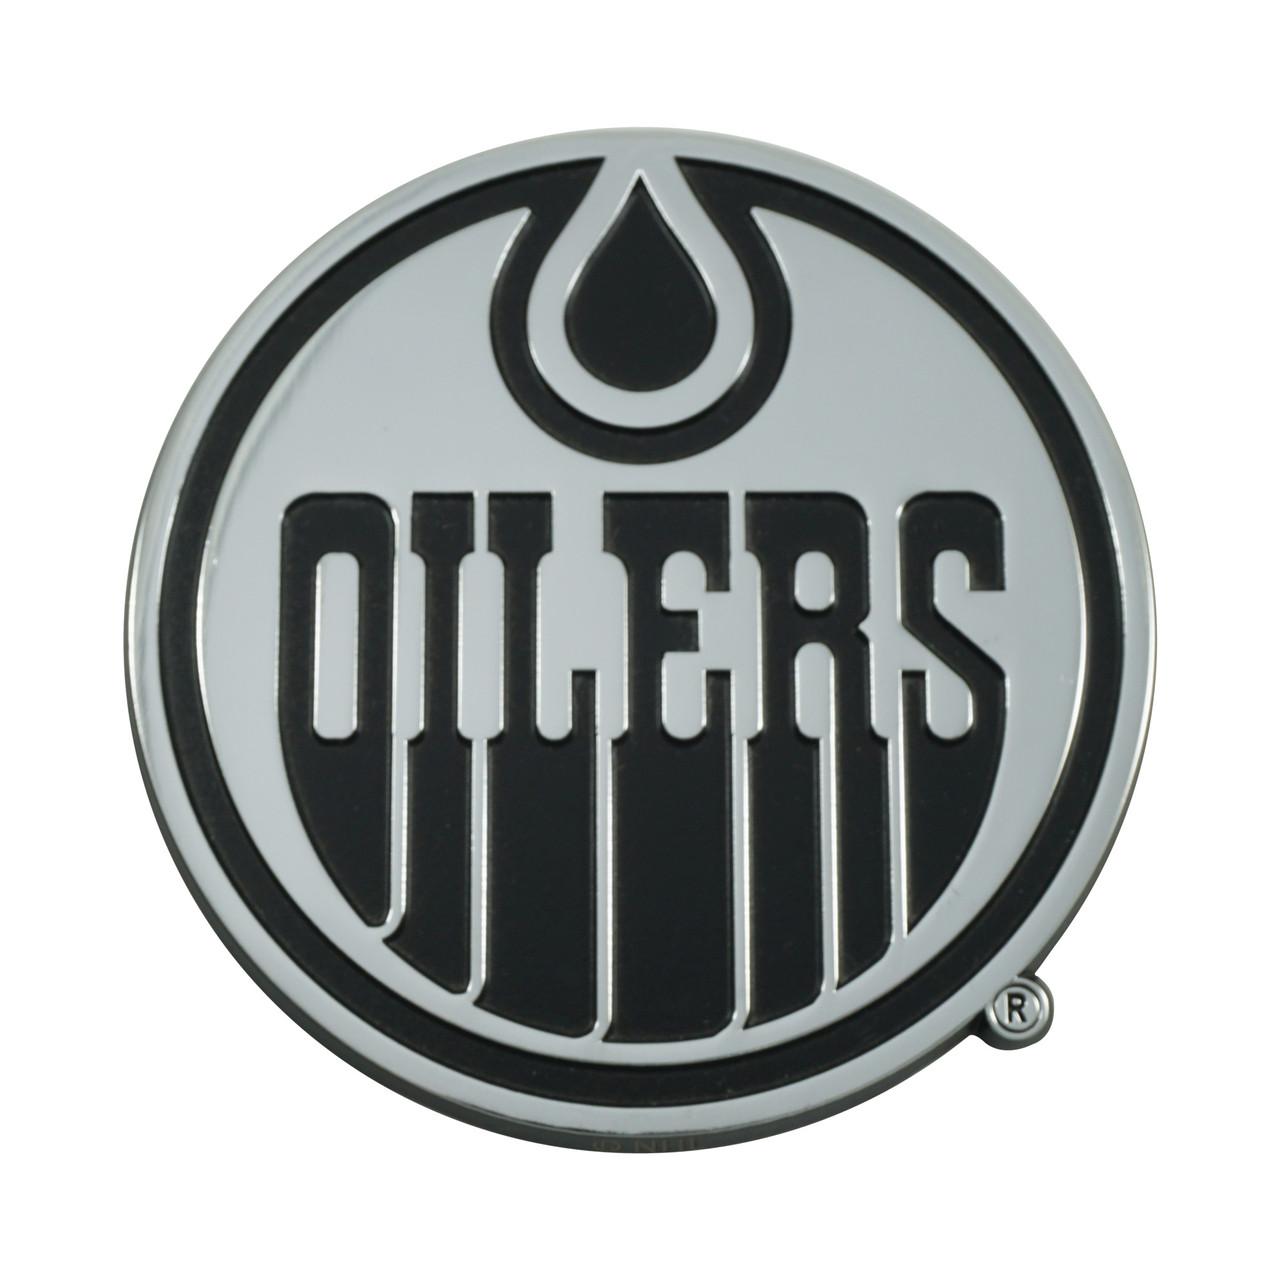 Edmonton Oilers Auto Emblem Premium Metal Chrome Special Order